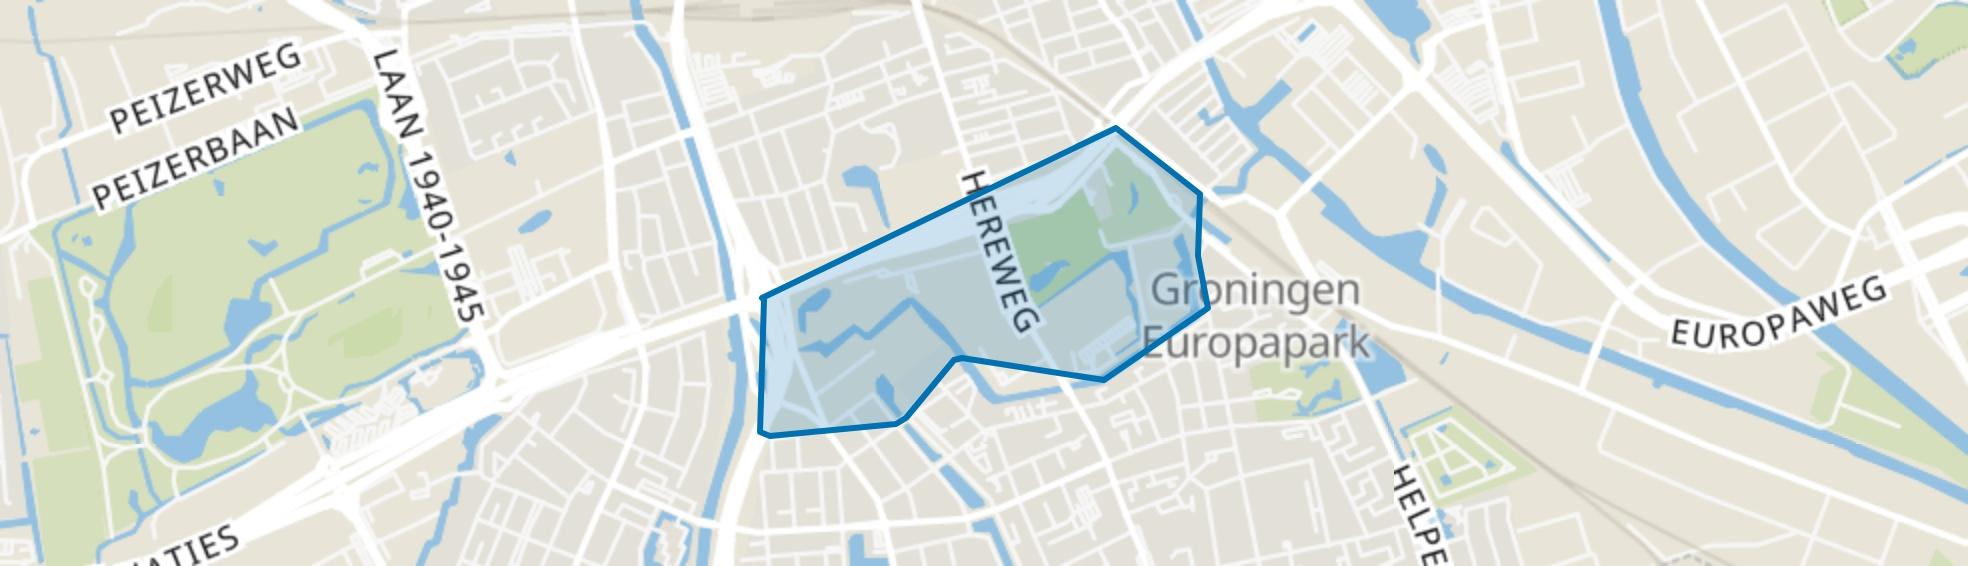 Sterrebosbuurt, Groningen map